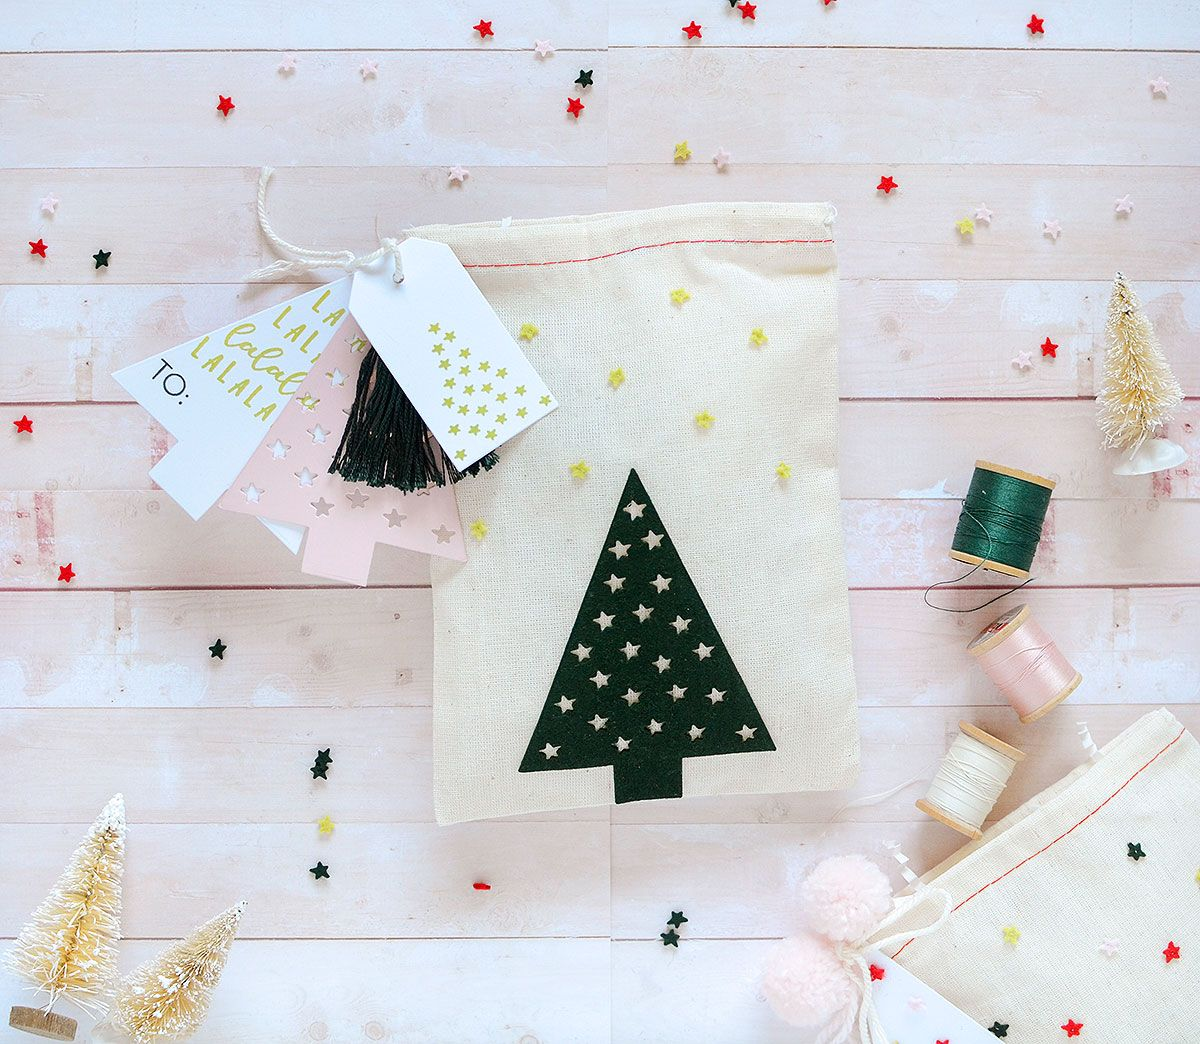 Vintage wedding decorations ideas november 2018 Christmas Tree Muslin Bag by Rebecca Luminarias for Papertrey Ink